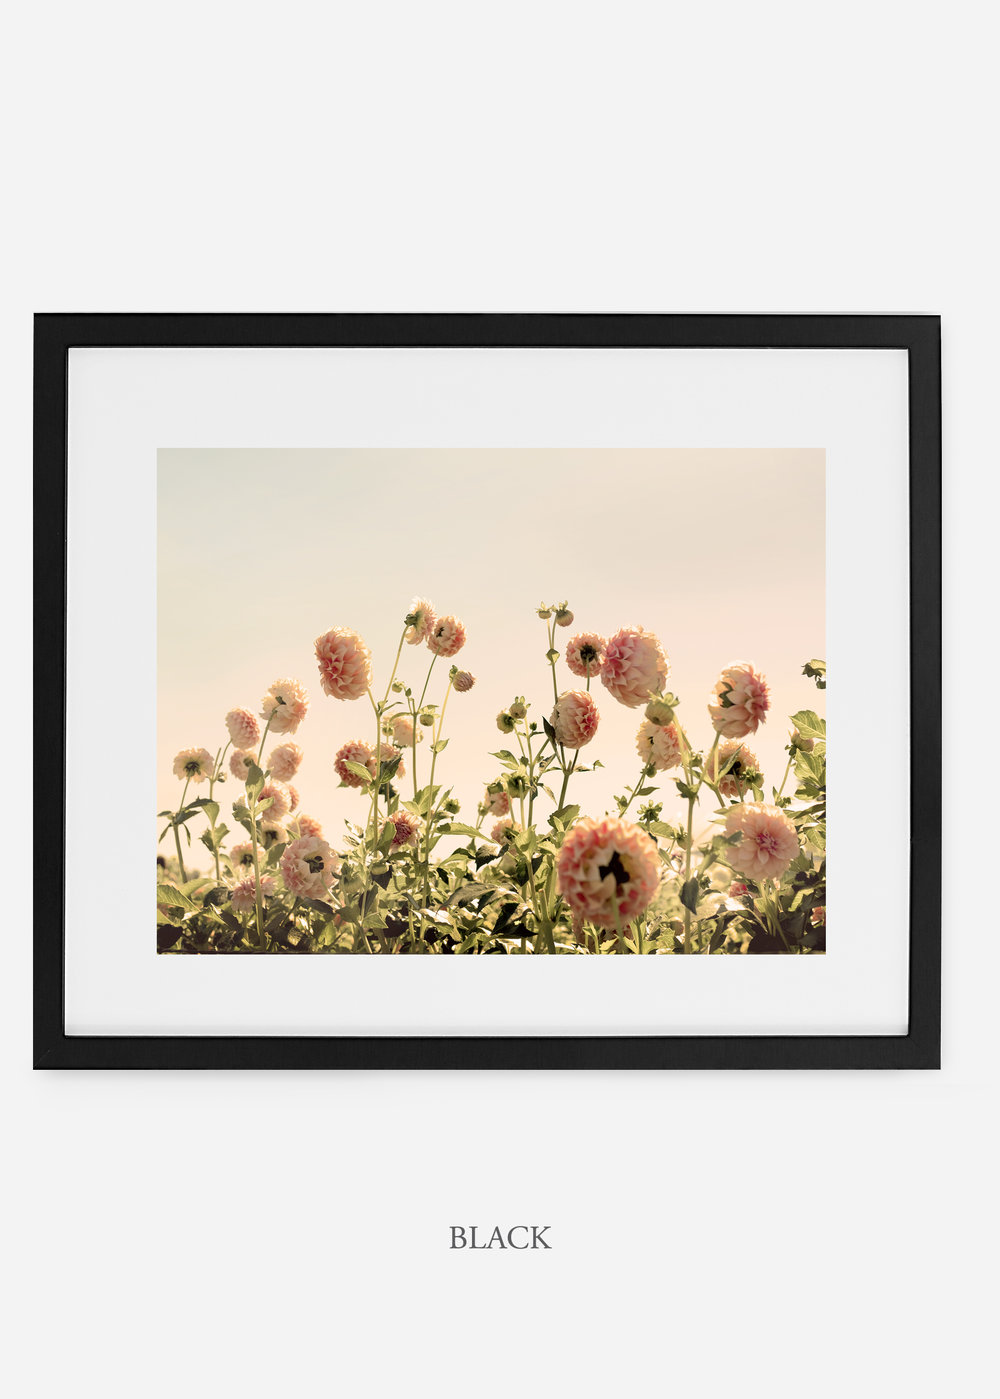 BlackFrame_DahliaNo.1_WilderCalifornia_Art_Floral_Homedecor_Prints_Dahlia_Botanical_Artwork_Interiordesign.jpg